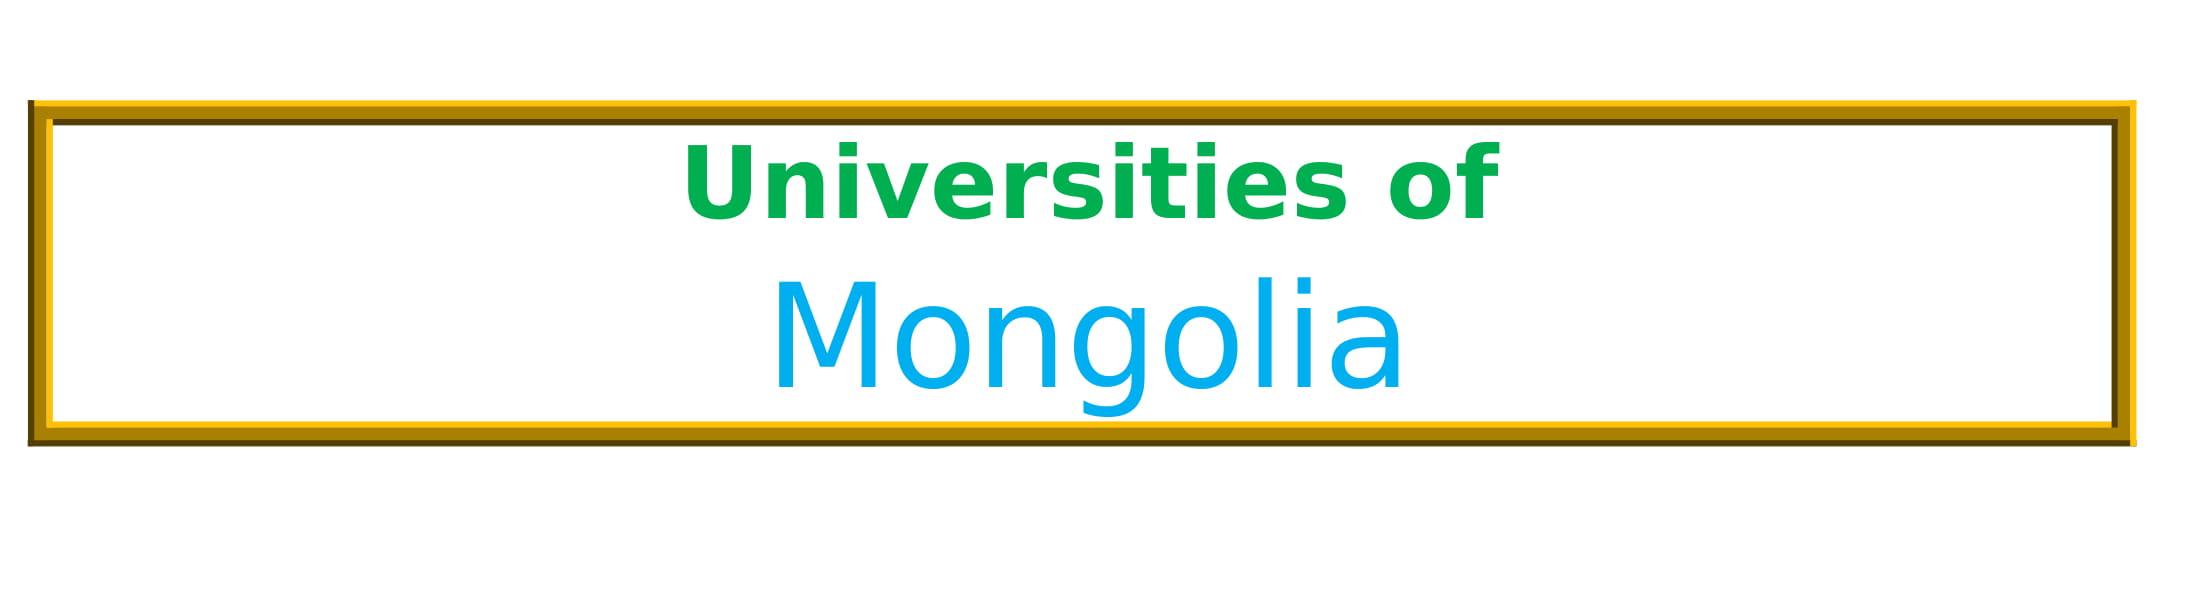 List of Universities in Mongolia